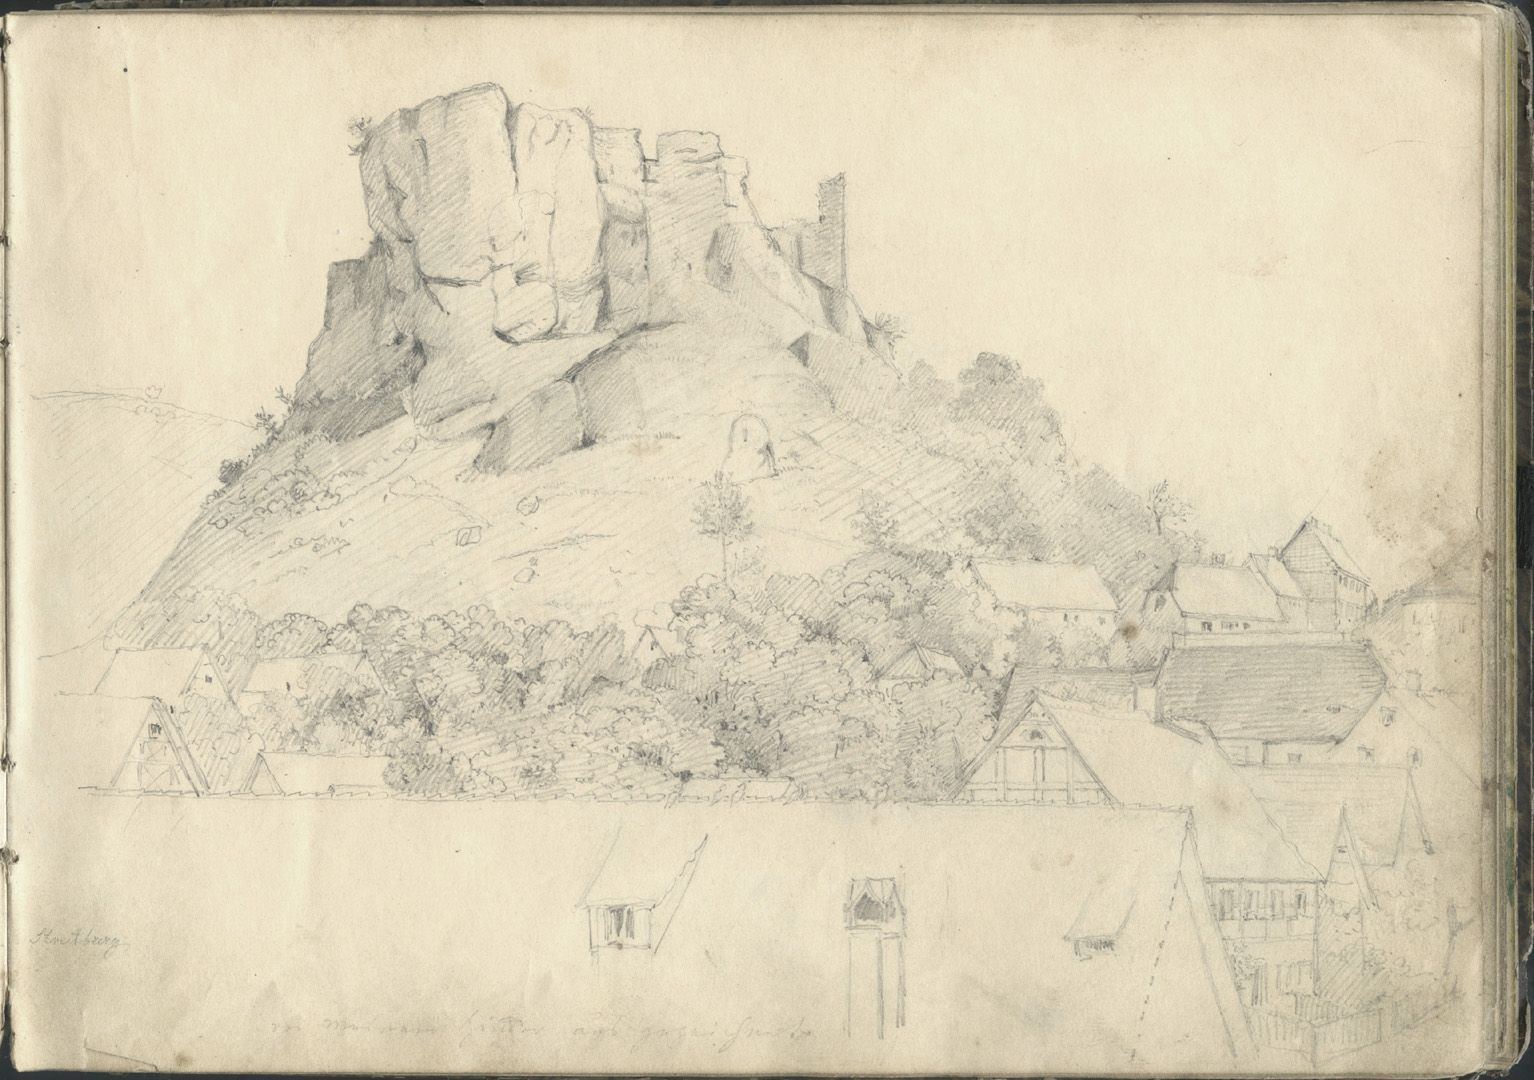 Sketchbook with views of Streitberg and Neideck / incl. Hallerweiherhaus in Nuremberg Streitberg